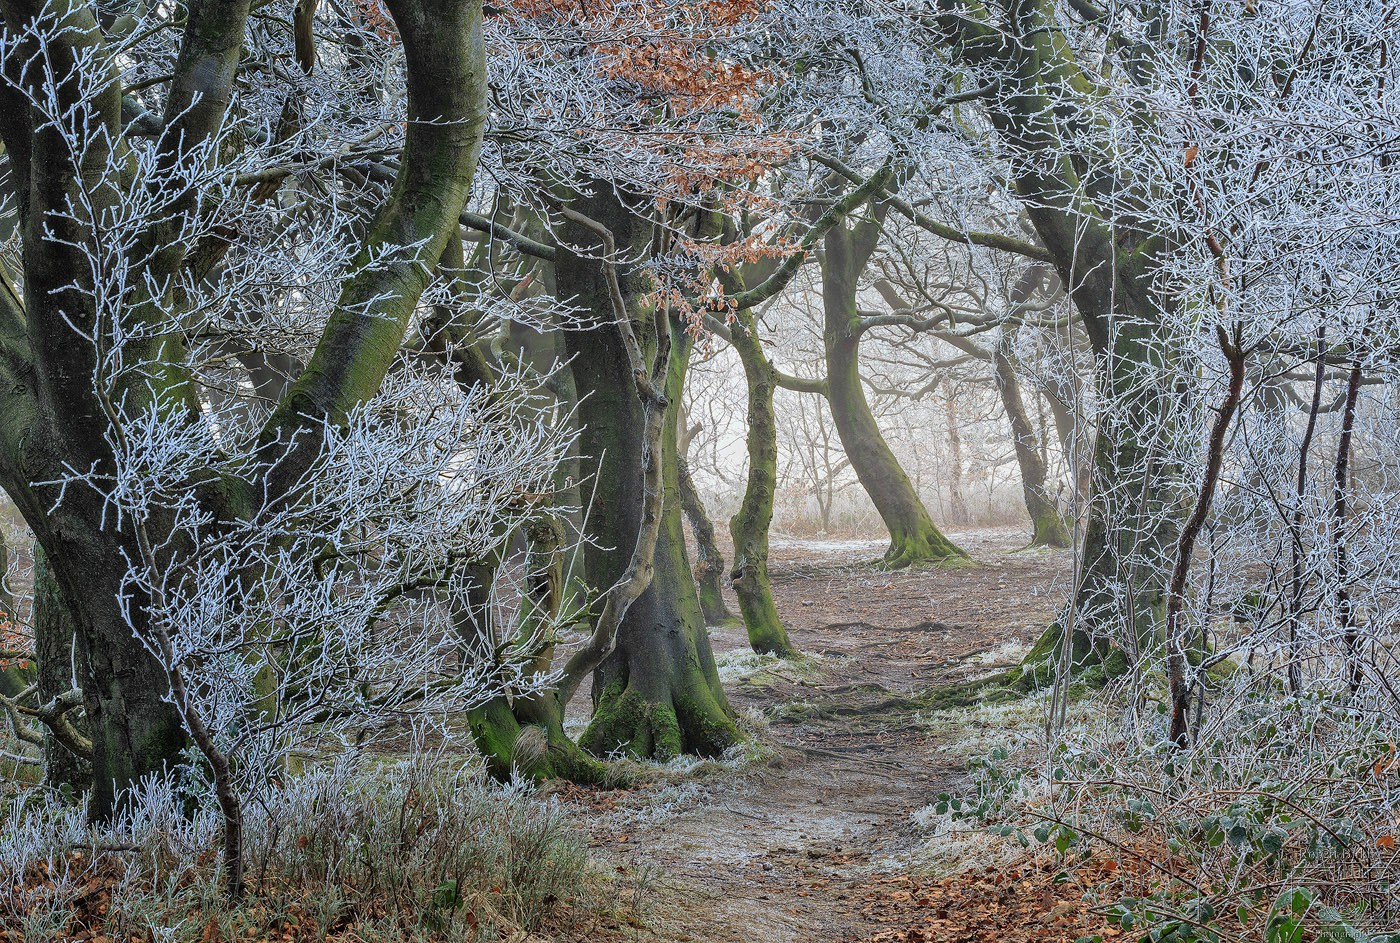 Painted White - Calderdale Landscapes